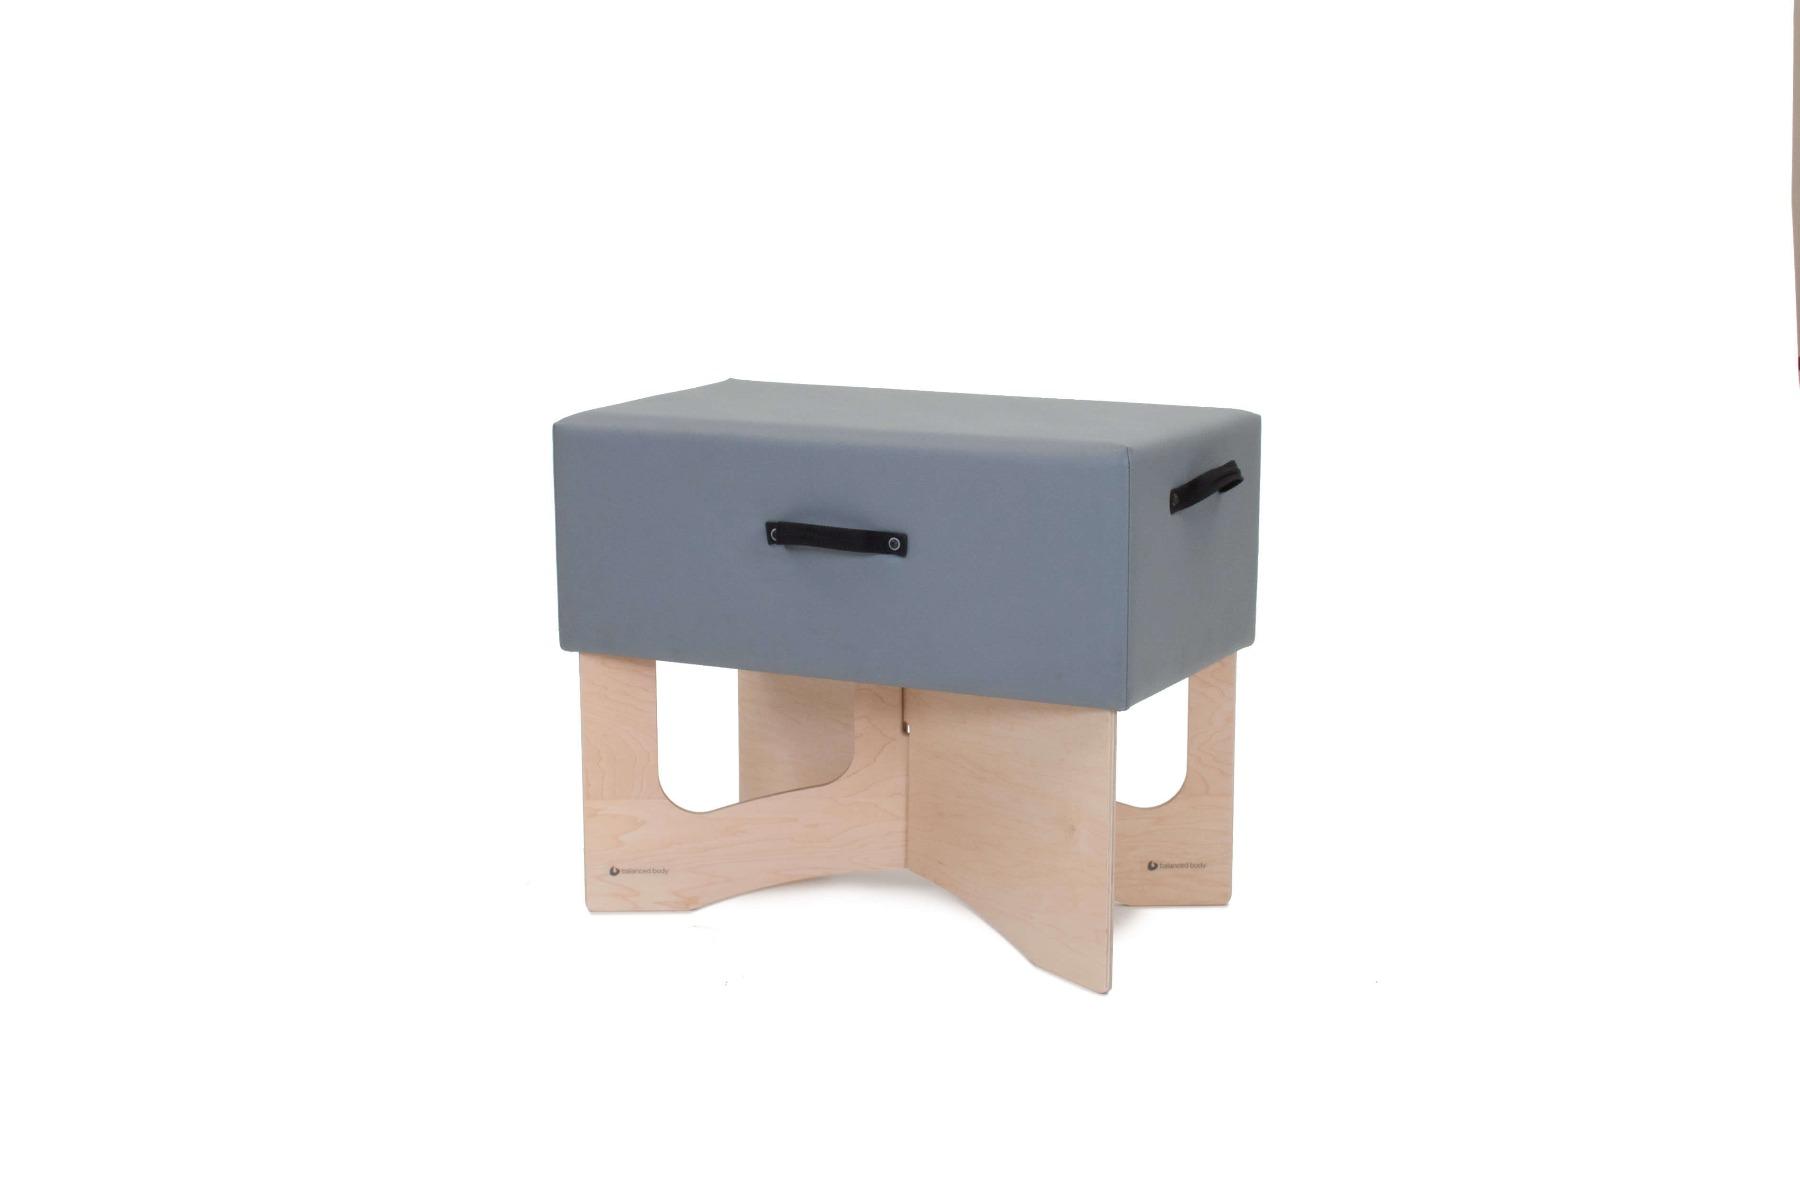 Sitting Box Riser Short für Exo Chair - 1